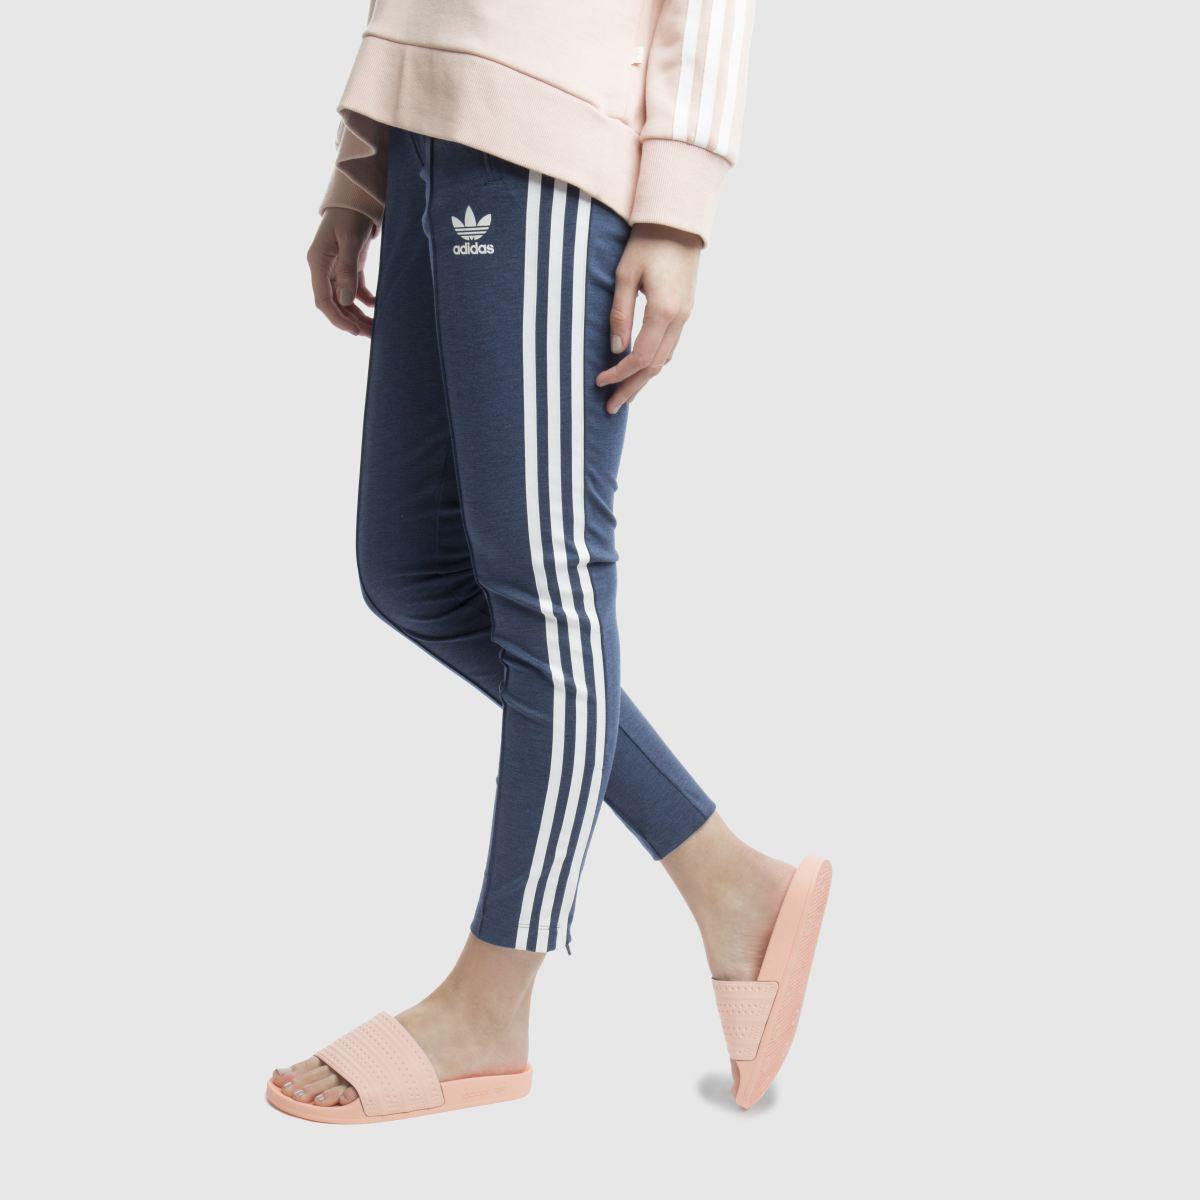 Damen Rosa adidas Adilette Slide Sandalen | schuh Gute Qualität beliebte Schuhe